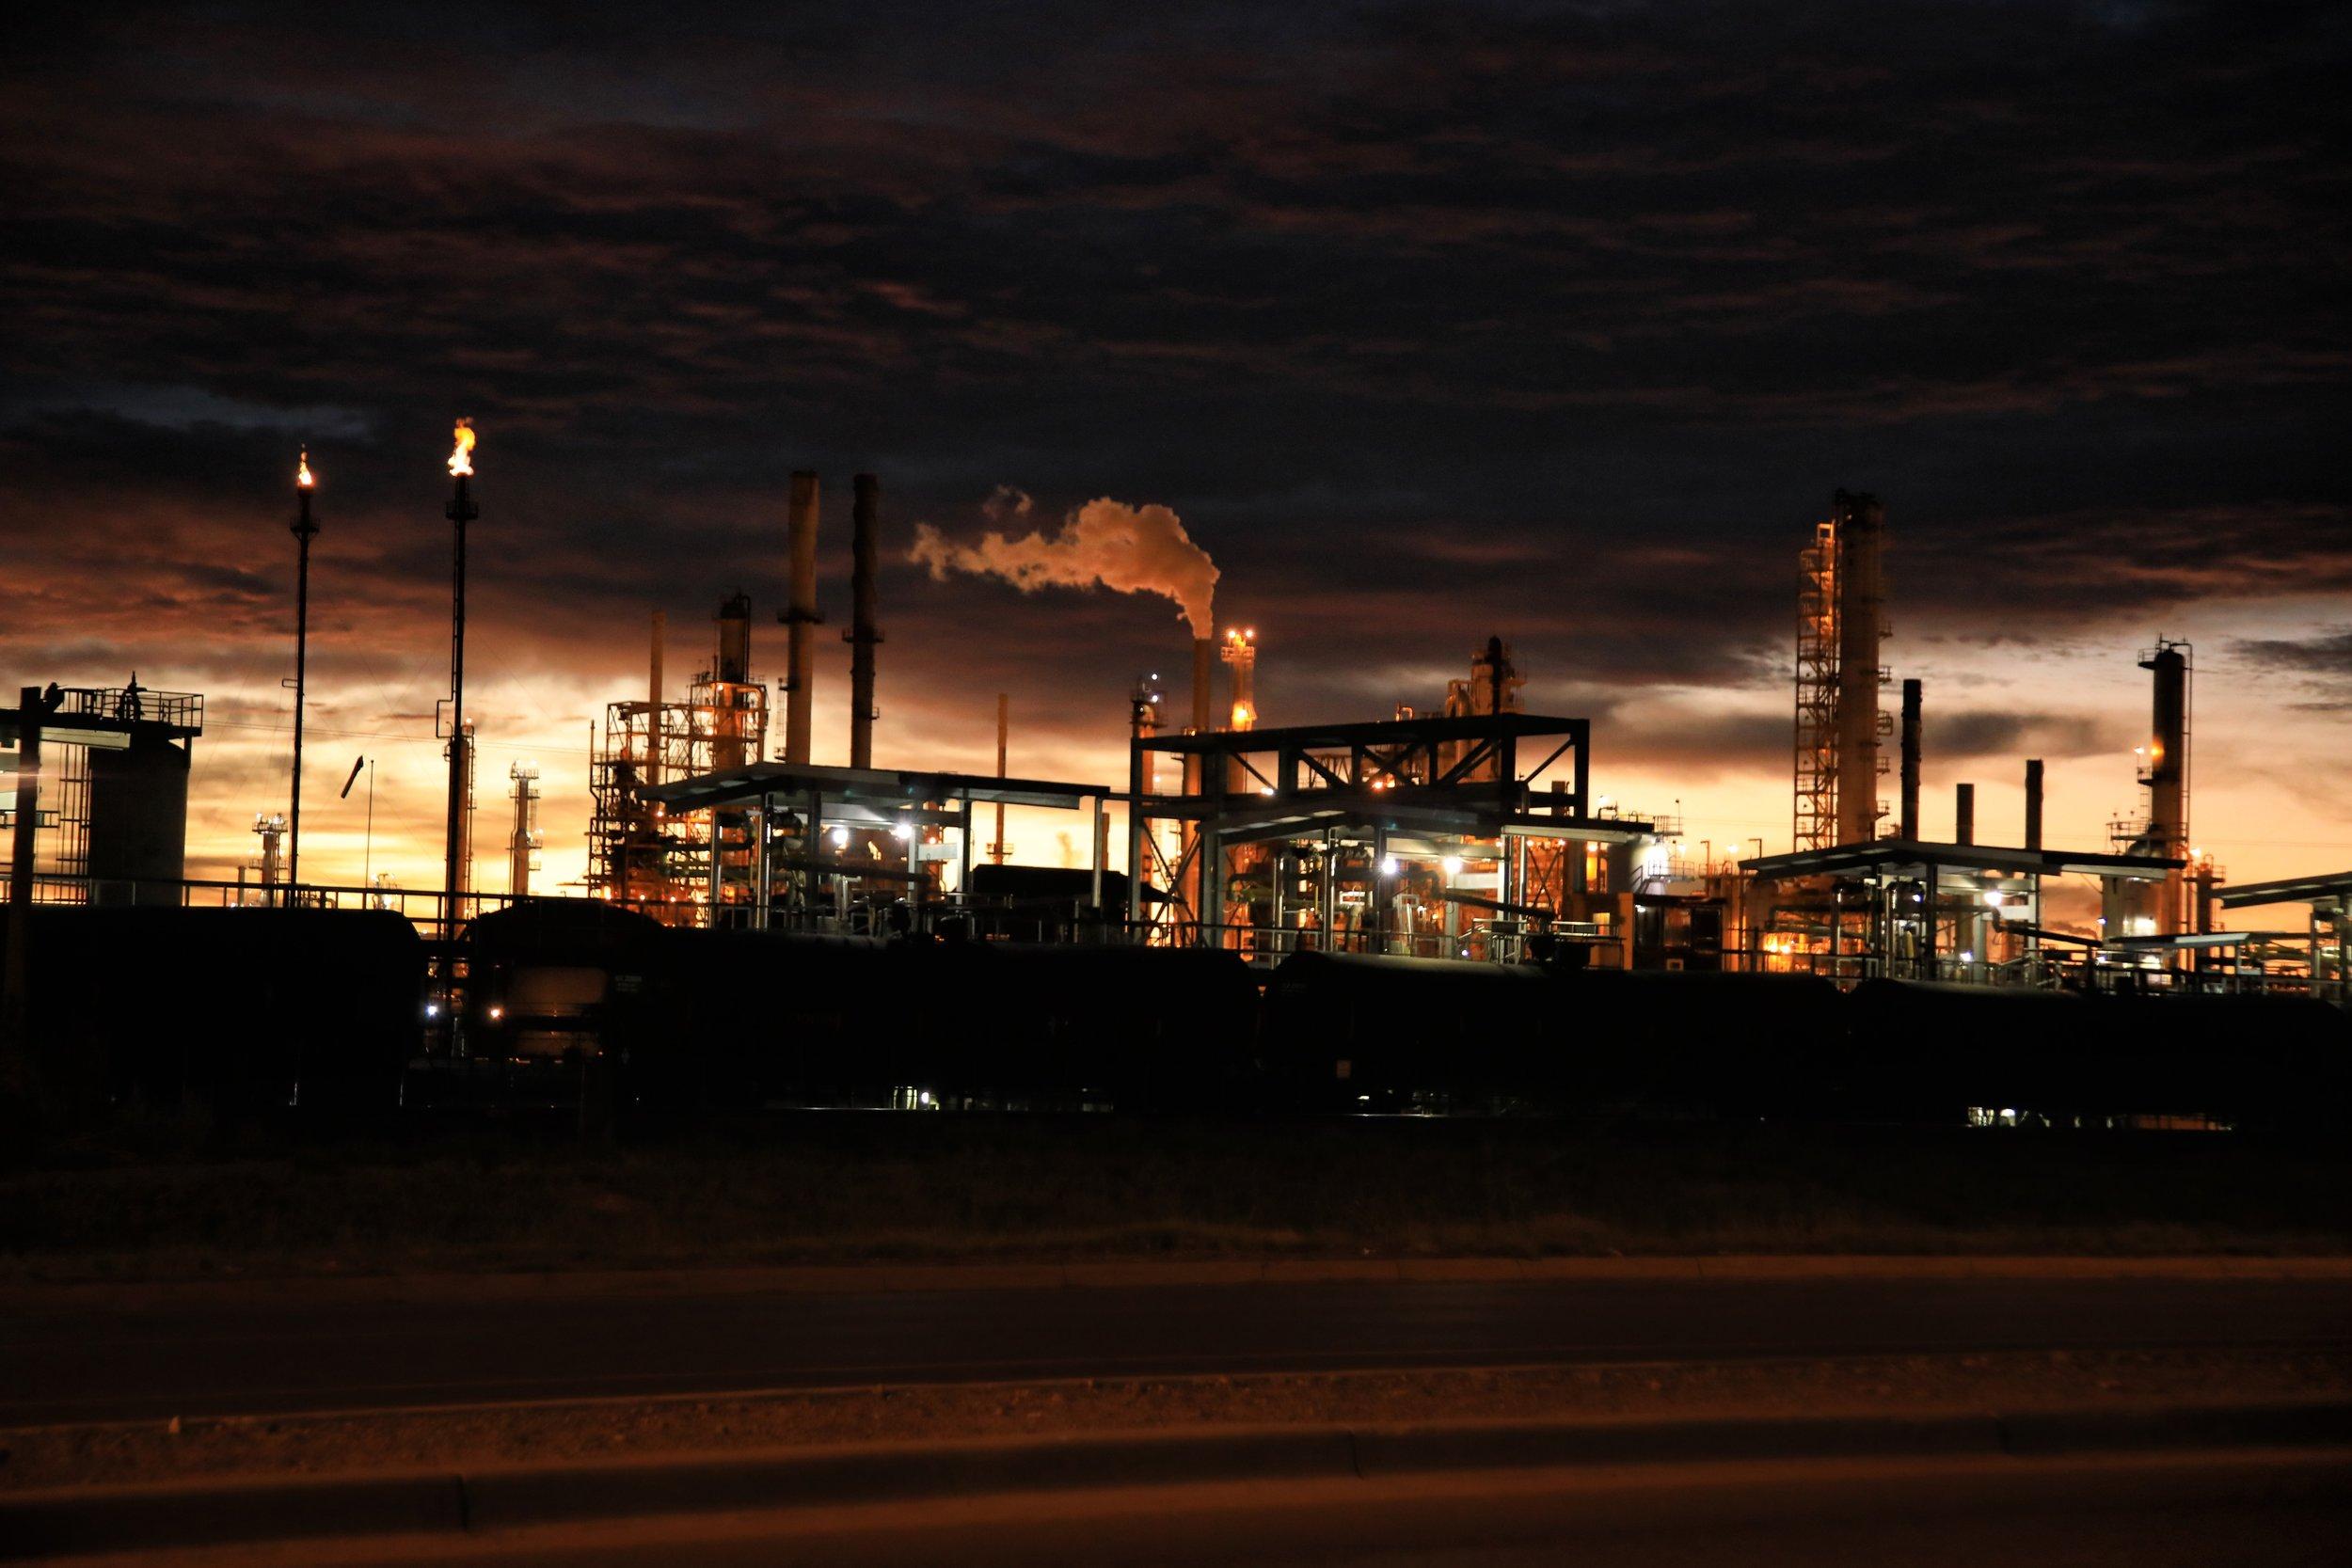 refinery-night-fugitive-emissions.jpg